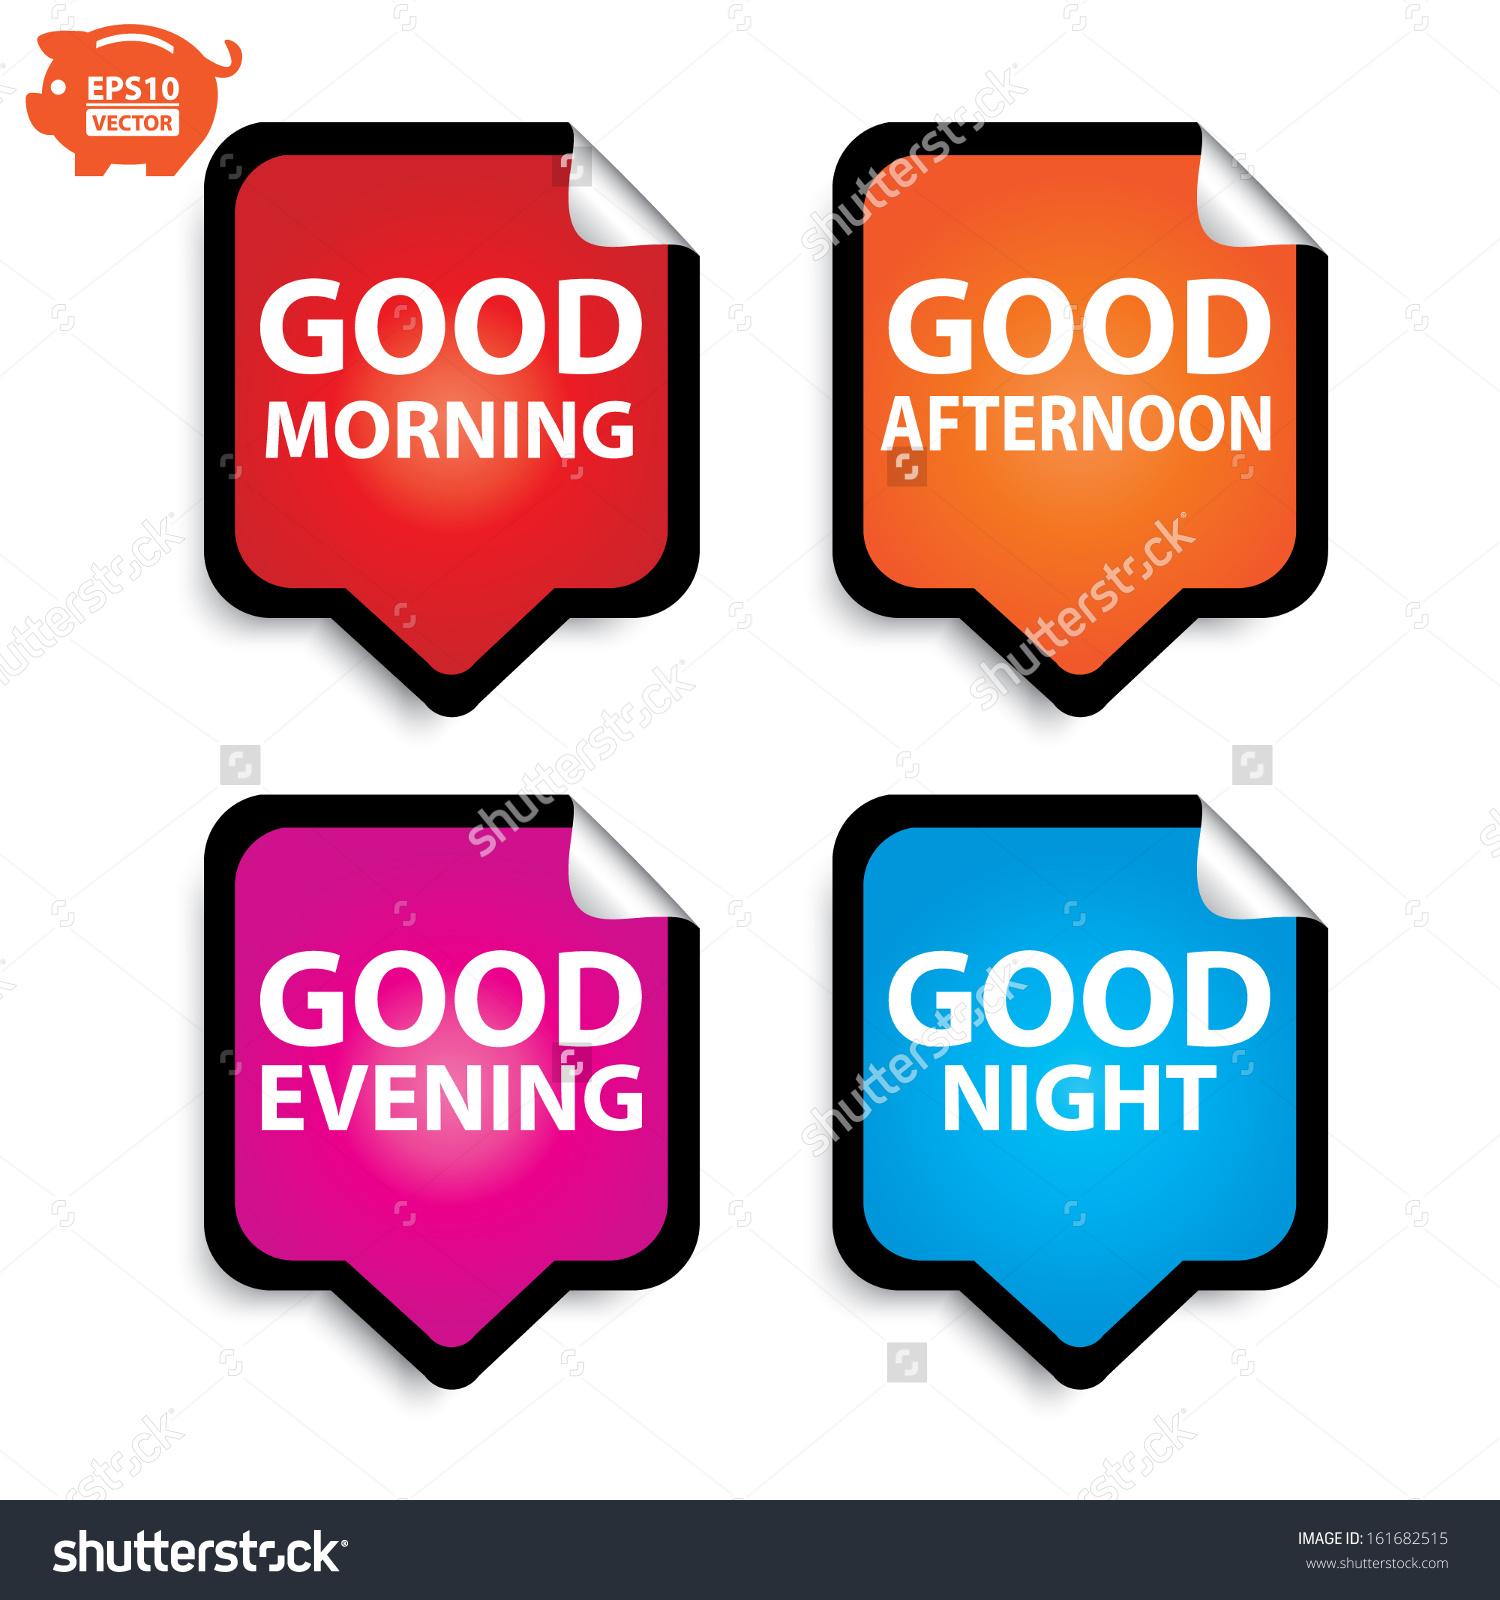 Good morning good afternoon good evening clipart svg library Vector Good Morning Good Afternoon Good Stock Vector 161682515 ... svg library